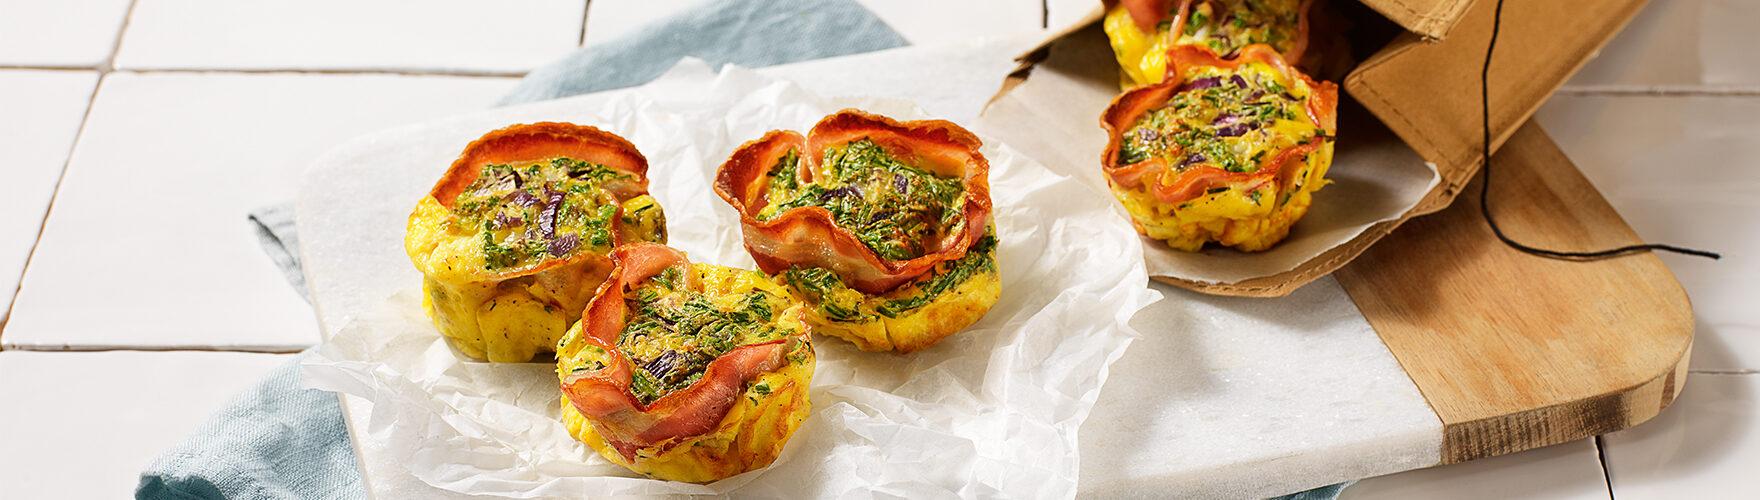 Hartige muffins met ei en spek